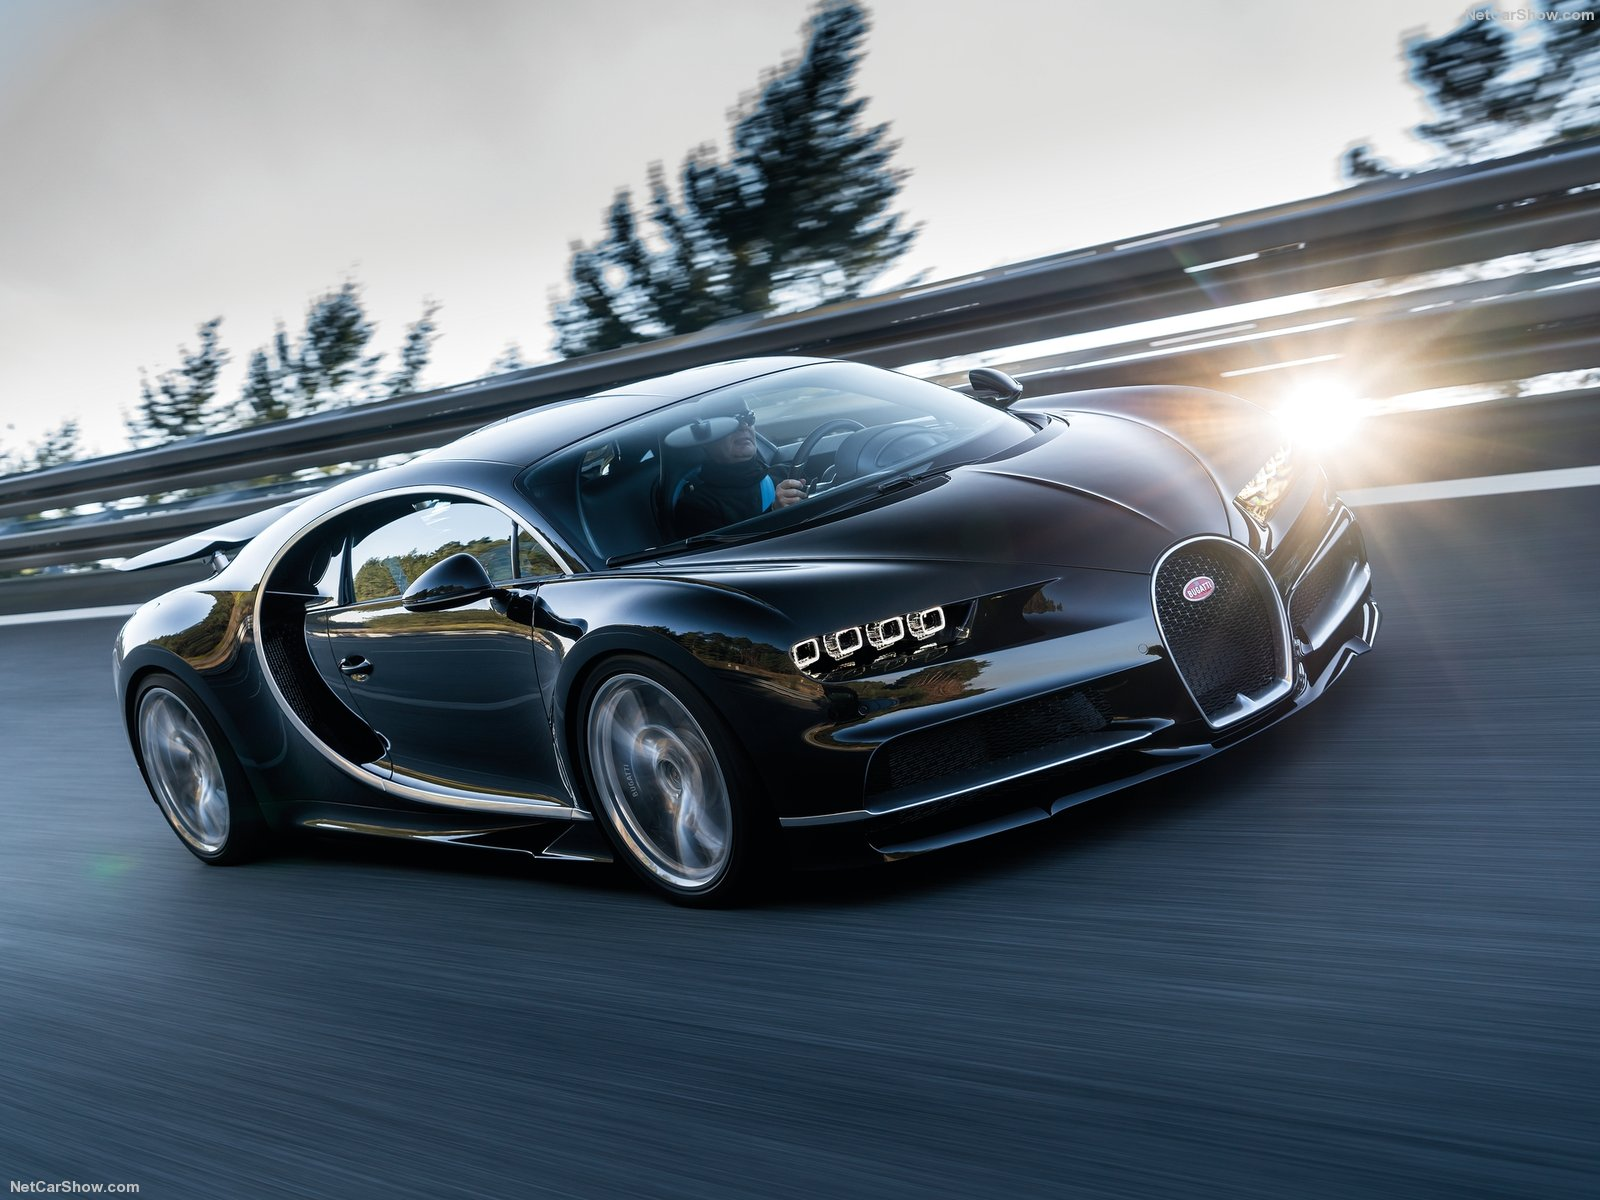 Bugatti-Chiron_2017_1600x1200_wallpaper_0b